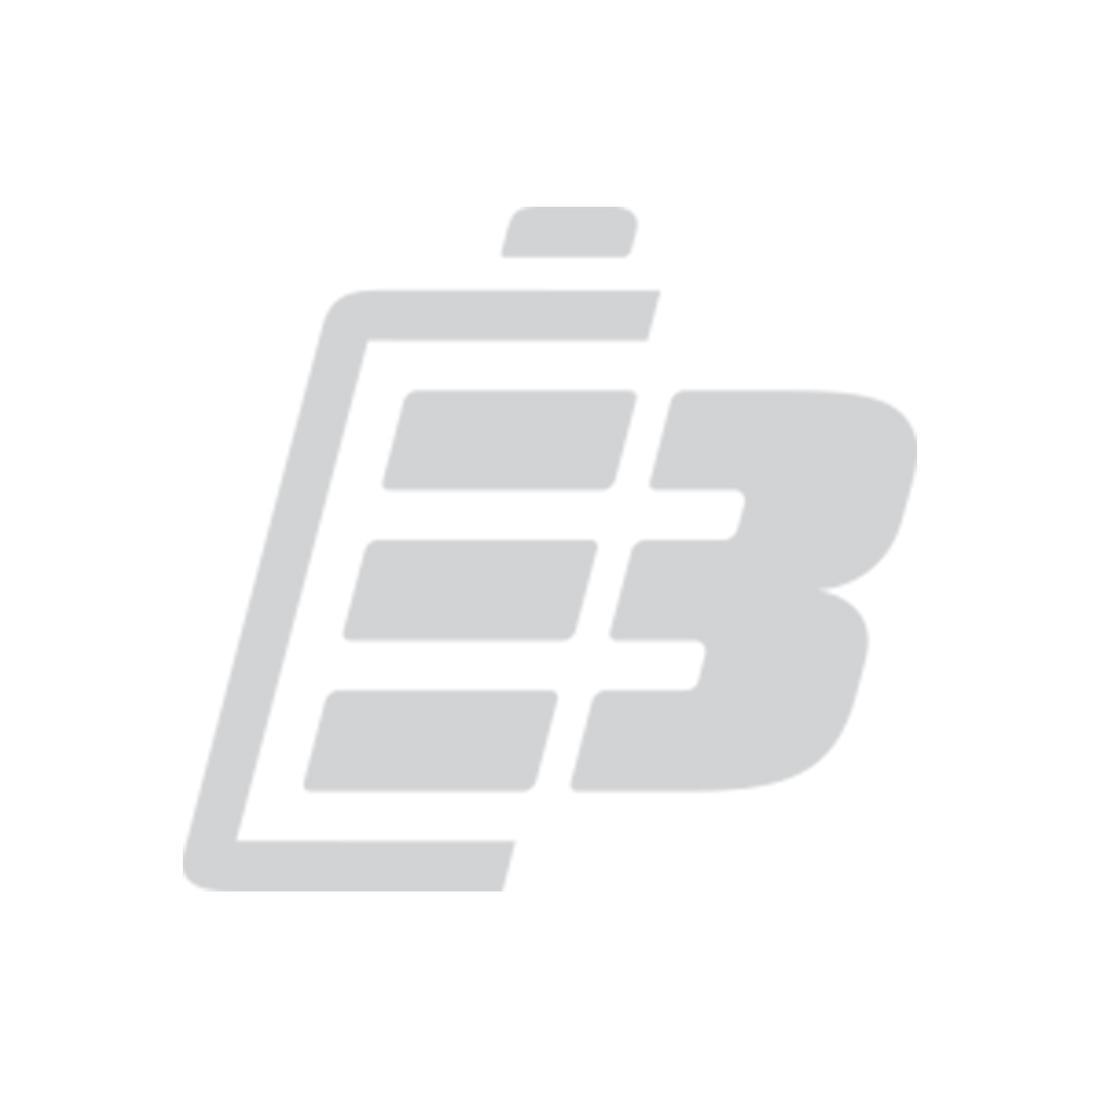 Duracell EasyTab DA 675 1